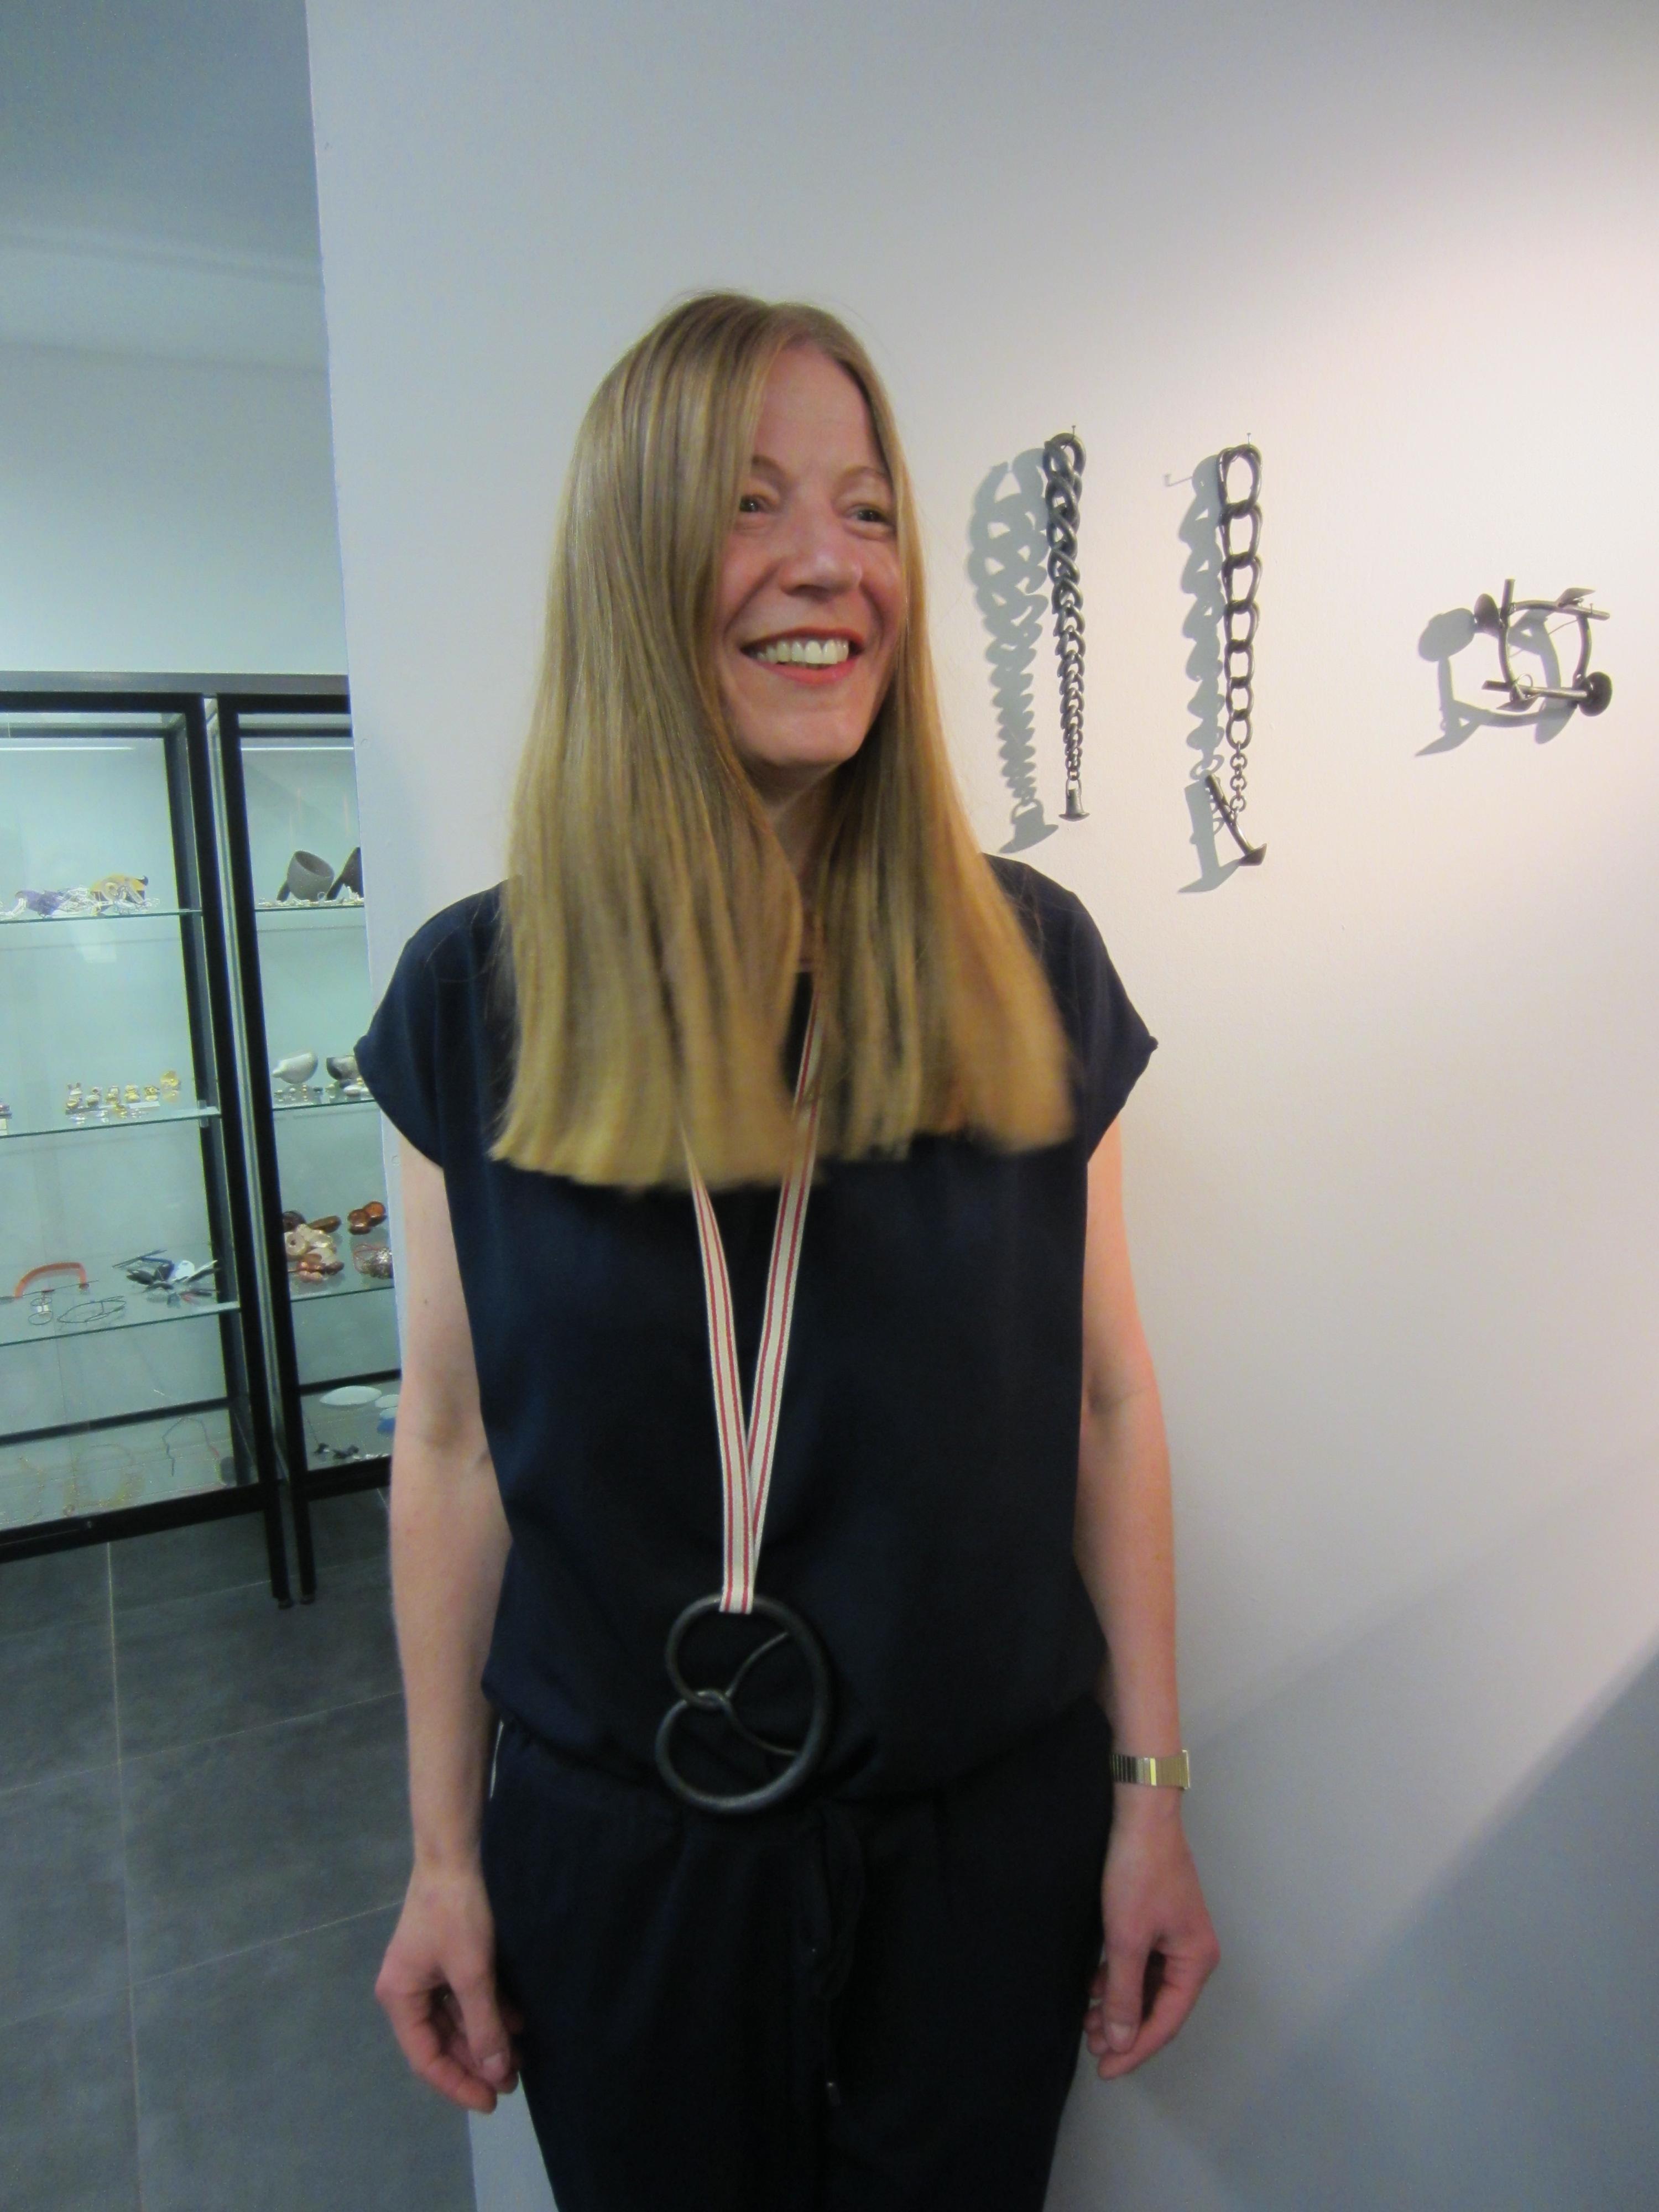 Jantje Fleischhut draagt halssieraad Sophie Hanagarth in Galerie Ra, portret, halssieraden, armband, vitrines